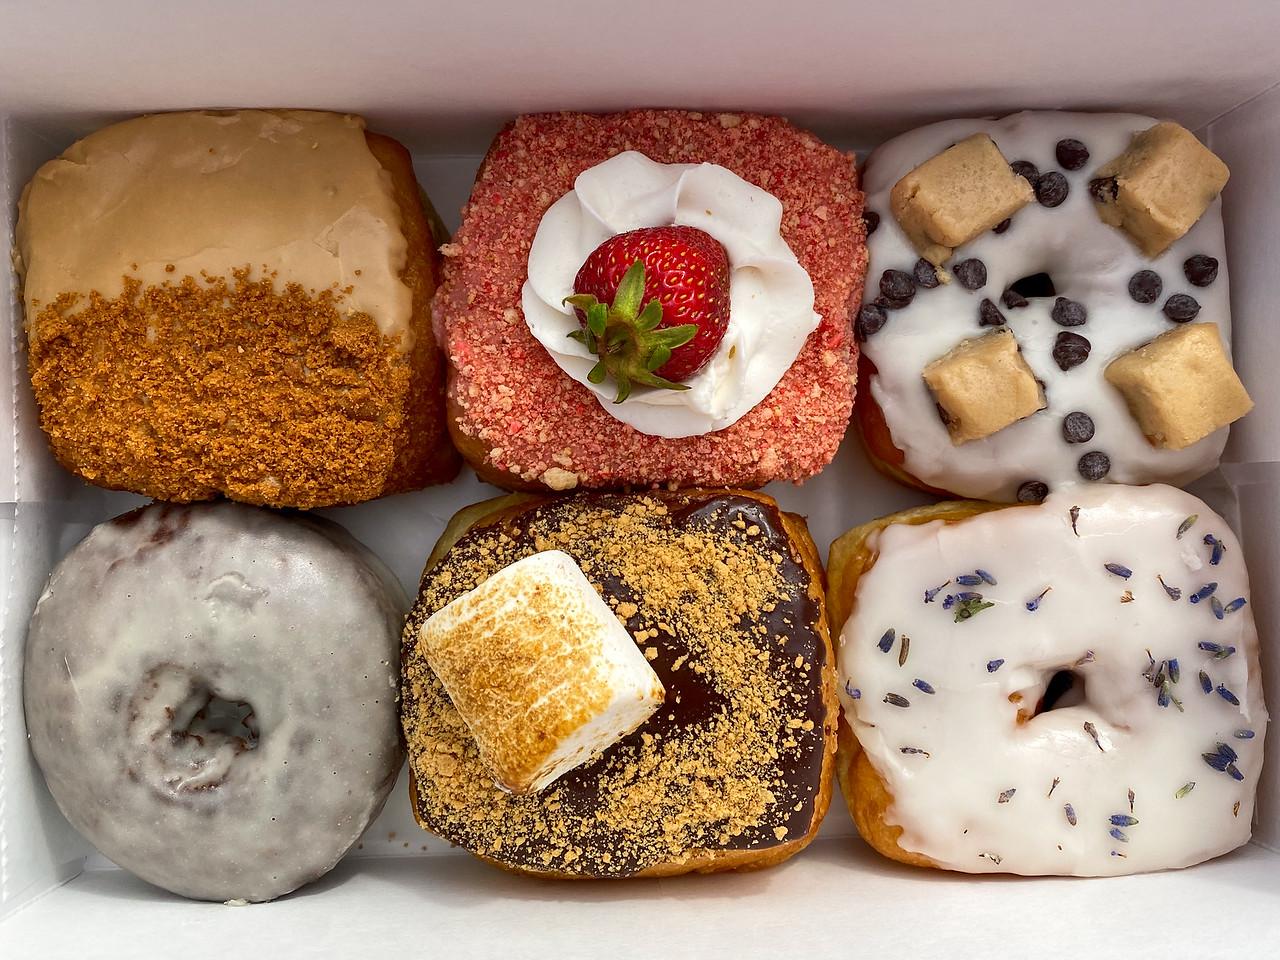 Vegan Doughnut Company donuts